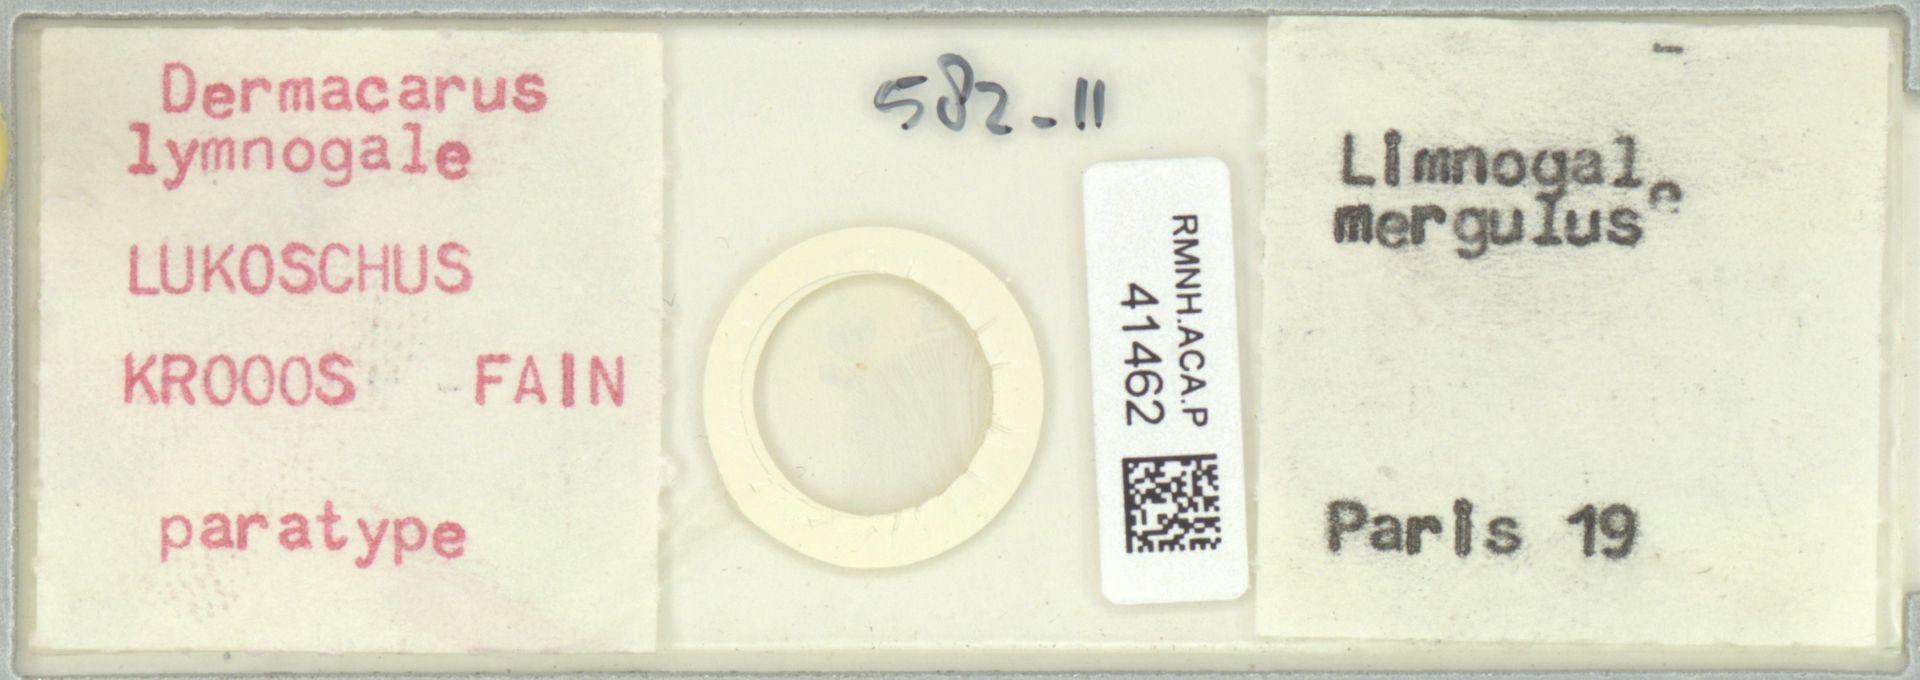 RMNH.ACA.P.41462   Dermacarus lymnogale Lukoschus, Kroos, Fain